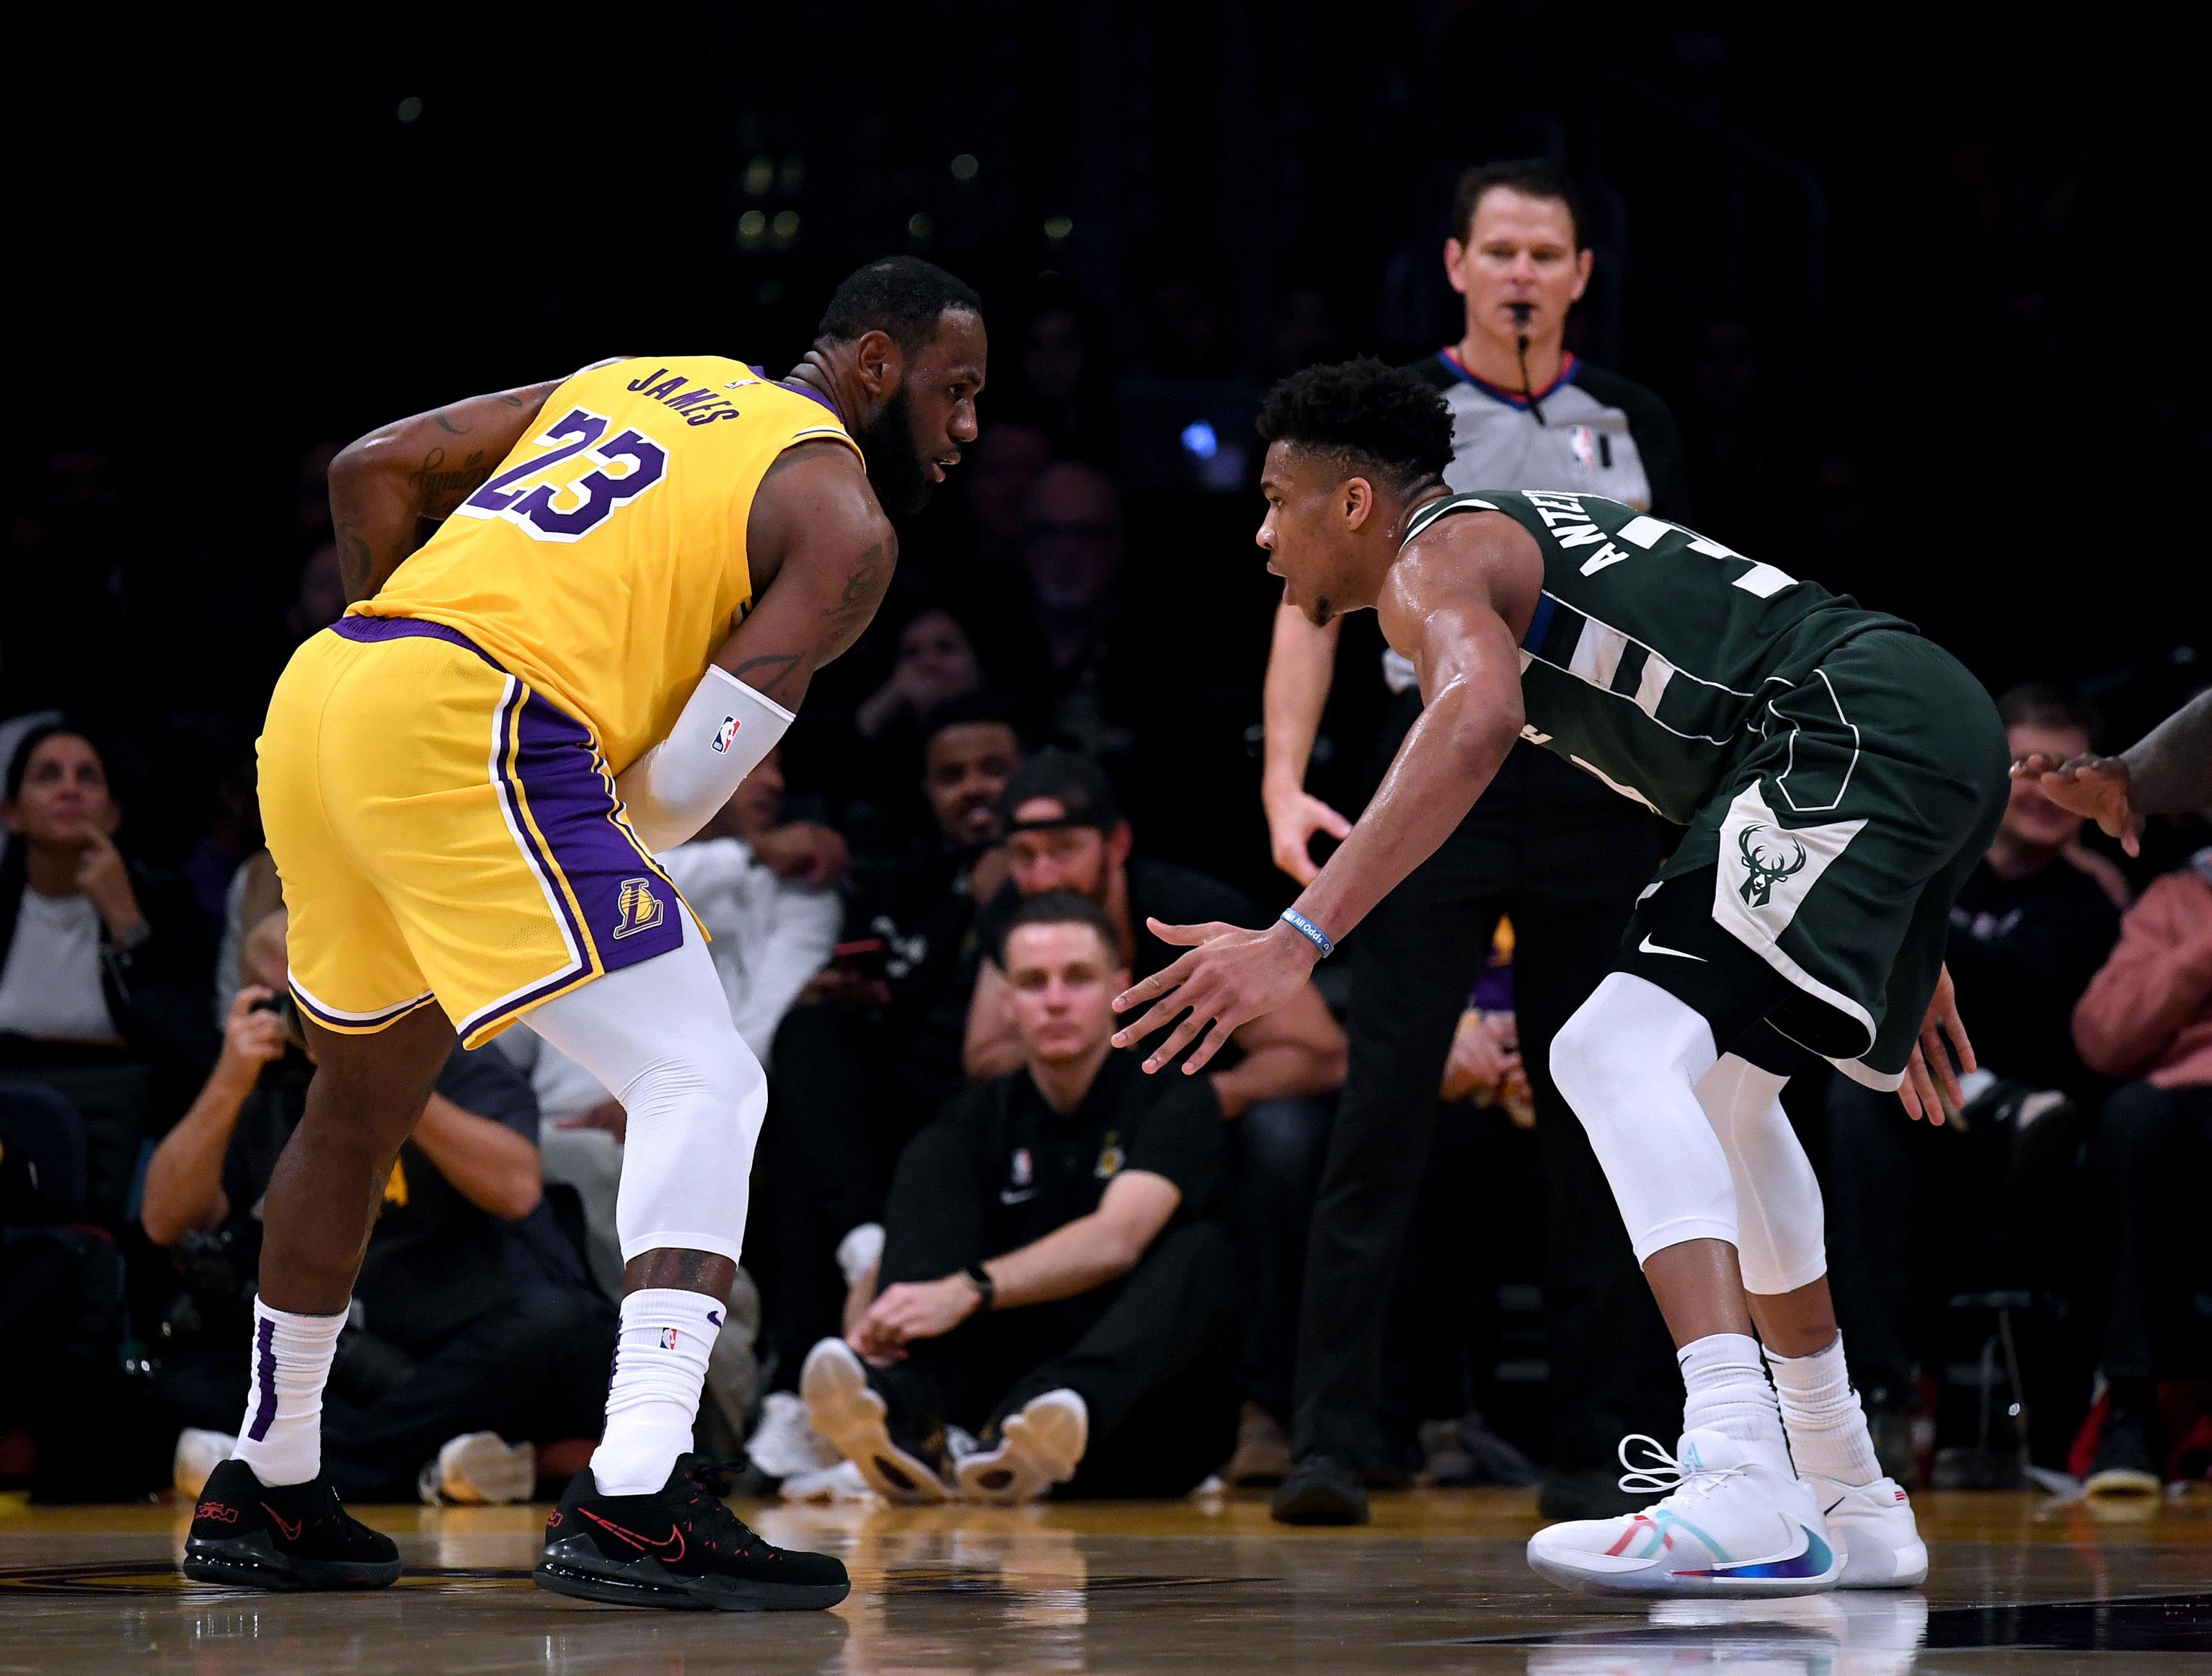 Imagining a potential Bucks-Lakers series in 2020 NBA Finals